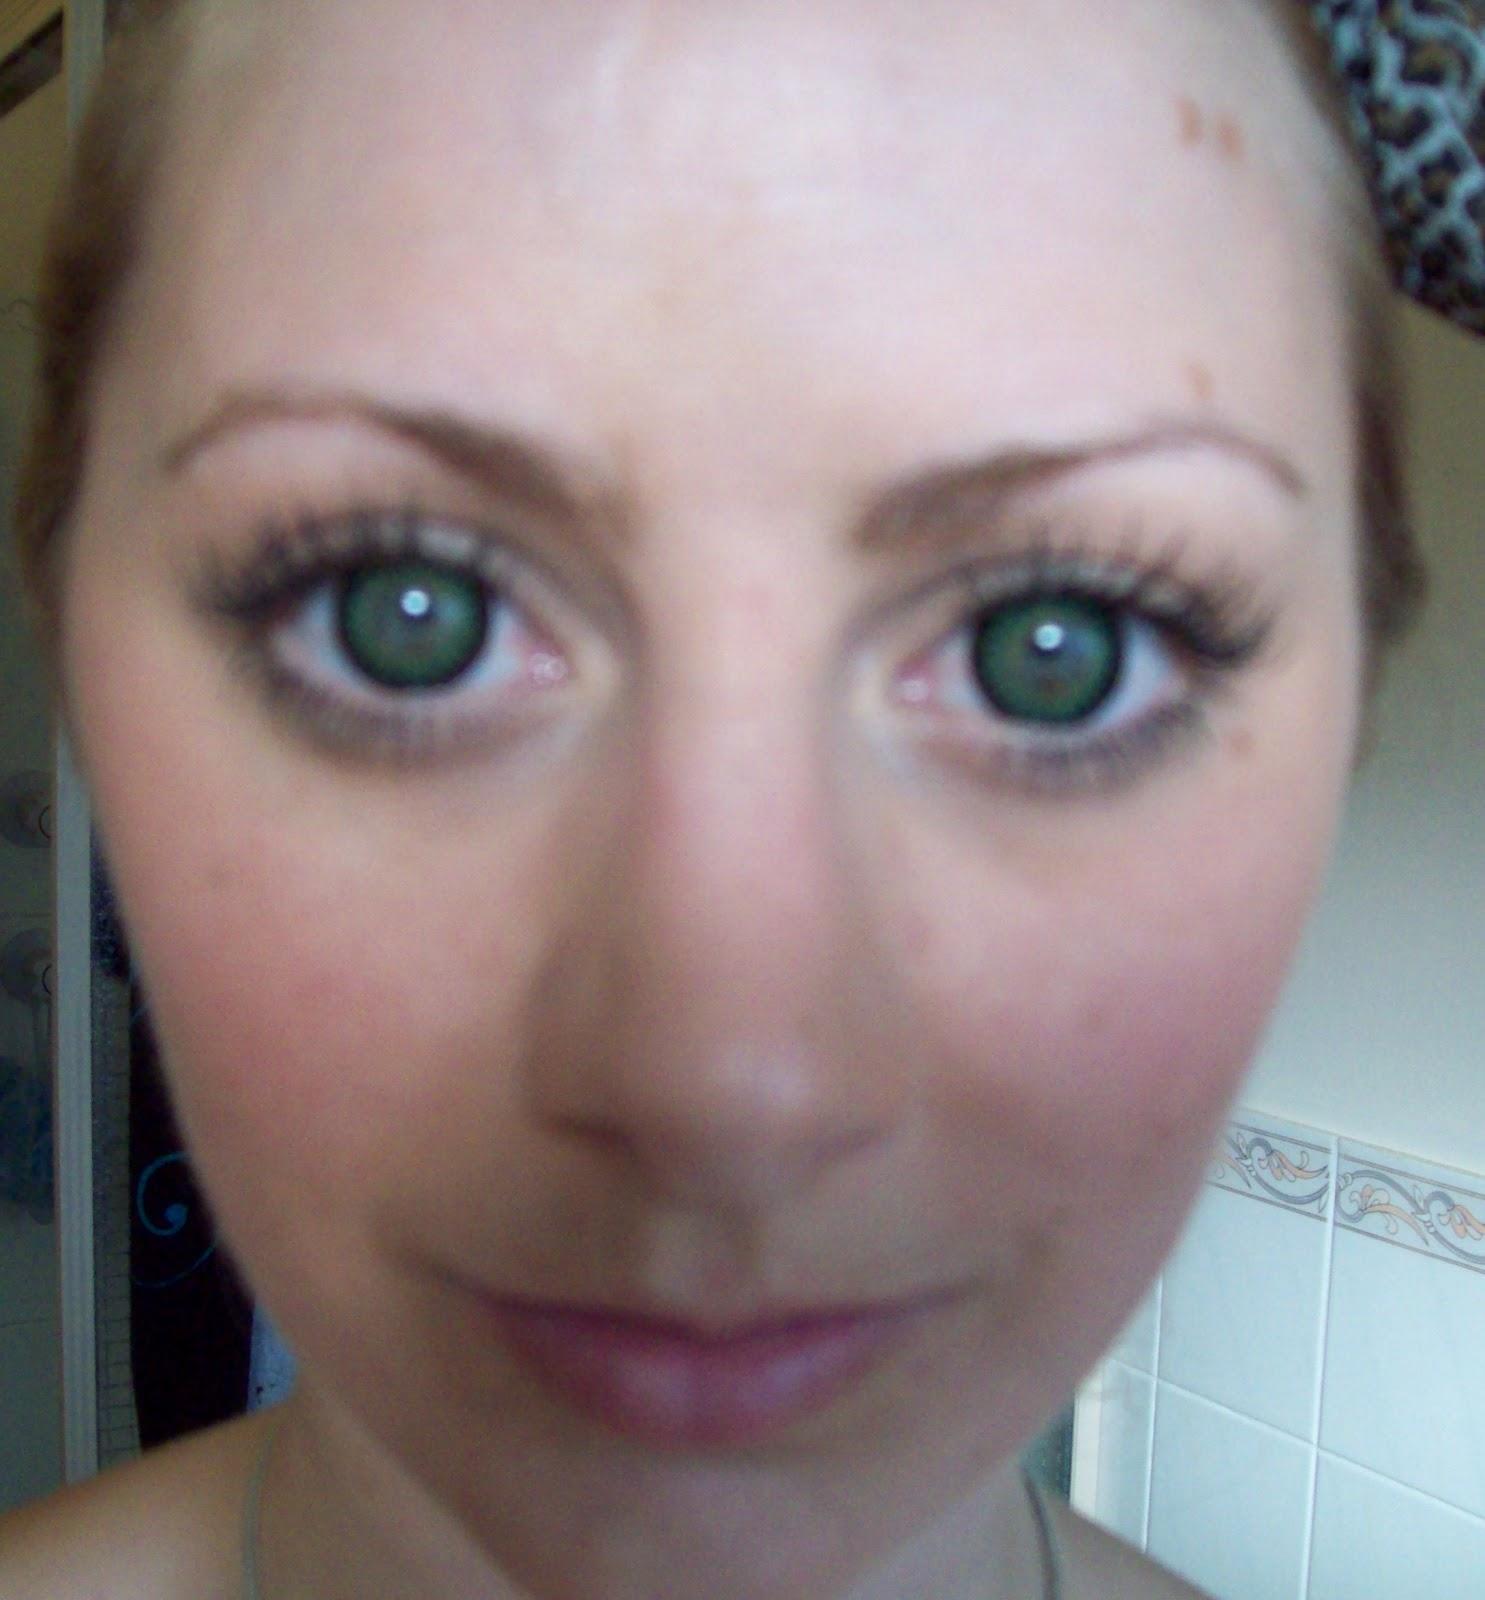 how to make green eyes look greener naturally